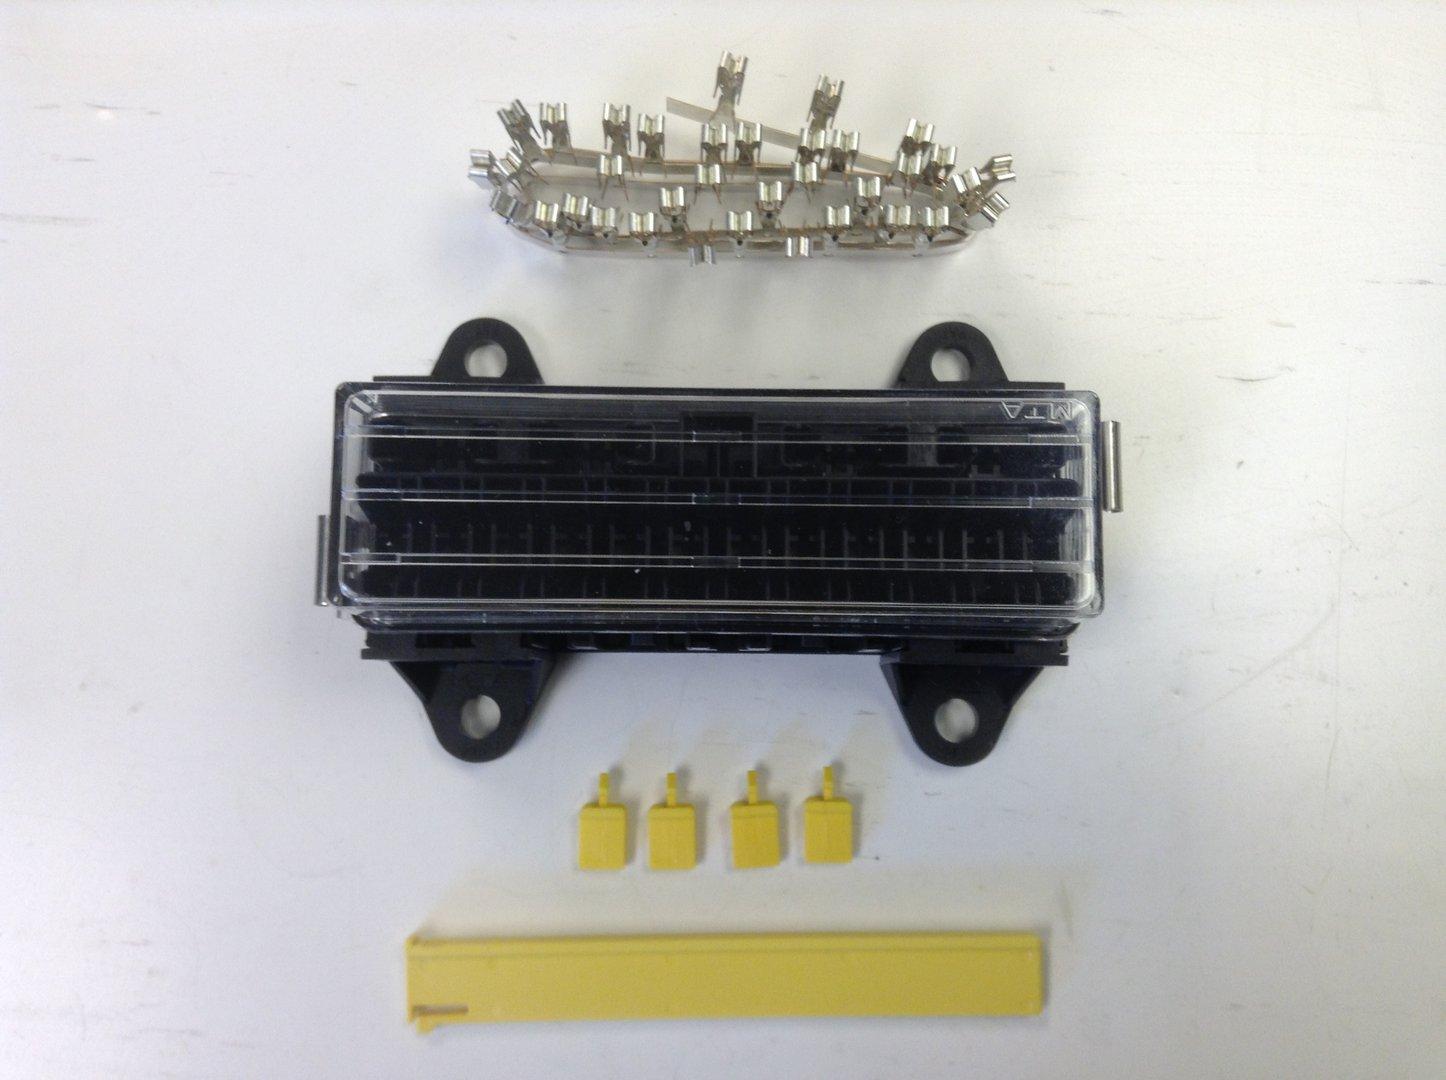 noblem12 m400 fuse box m12 16 way noblem12 m400 fuse box m12 16 way